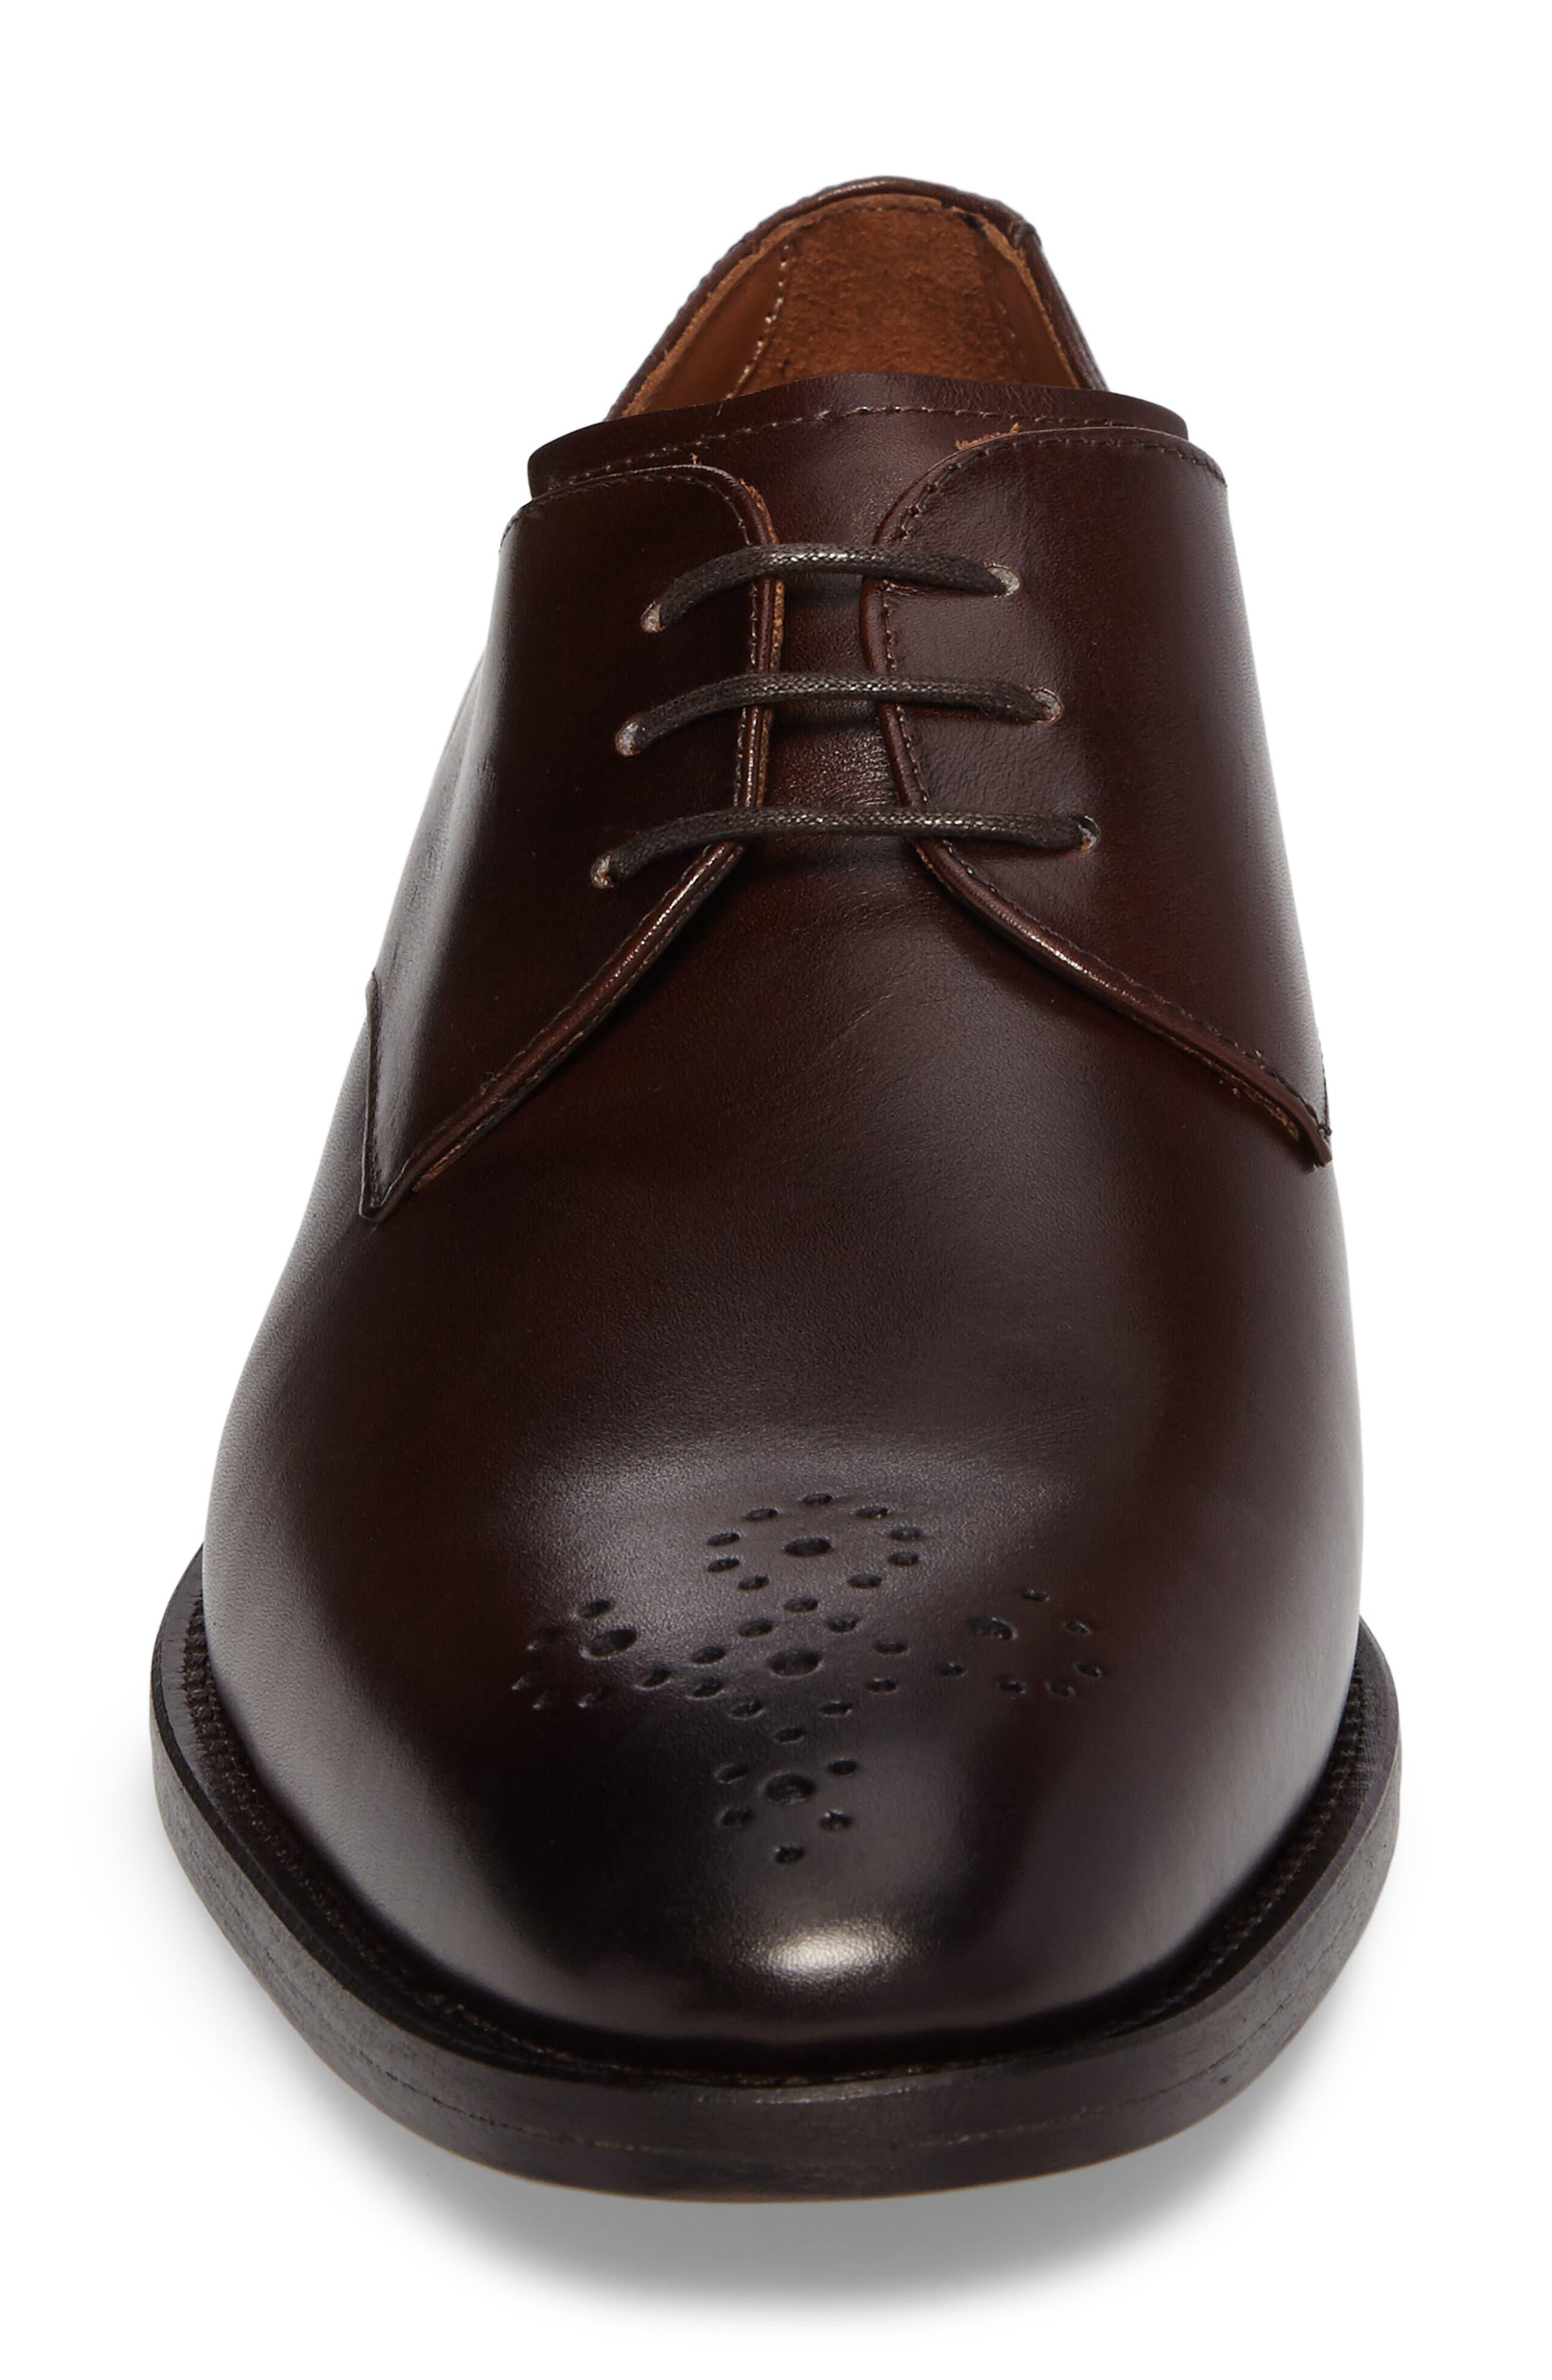 Haltter Medallion Toe Derby,                             Alternate thumbnail 4, color,                             Dark Brown Leather